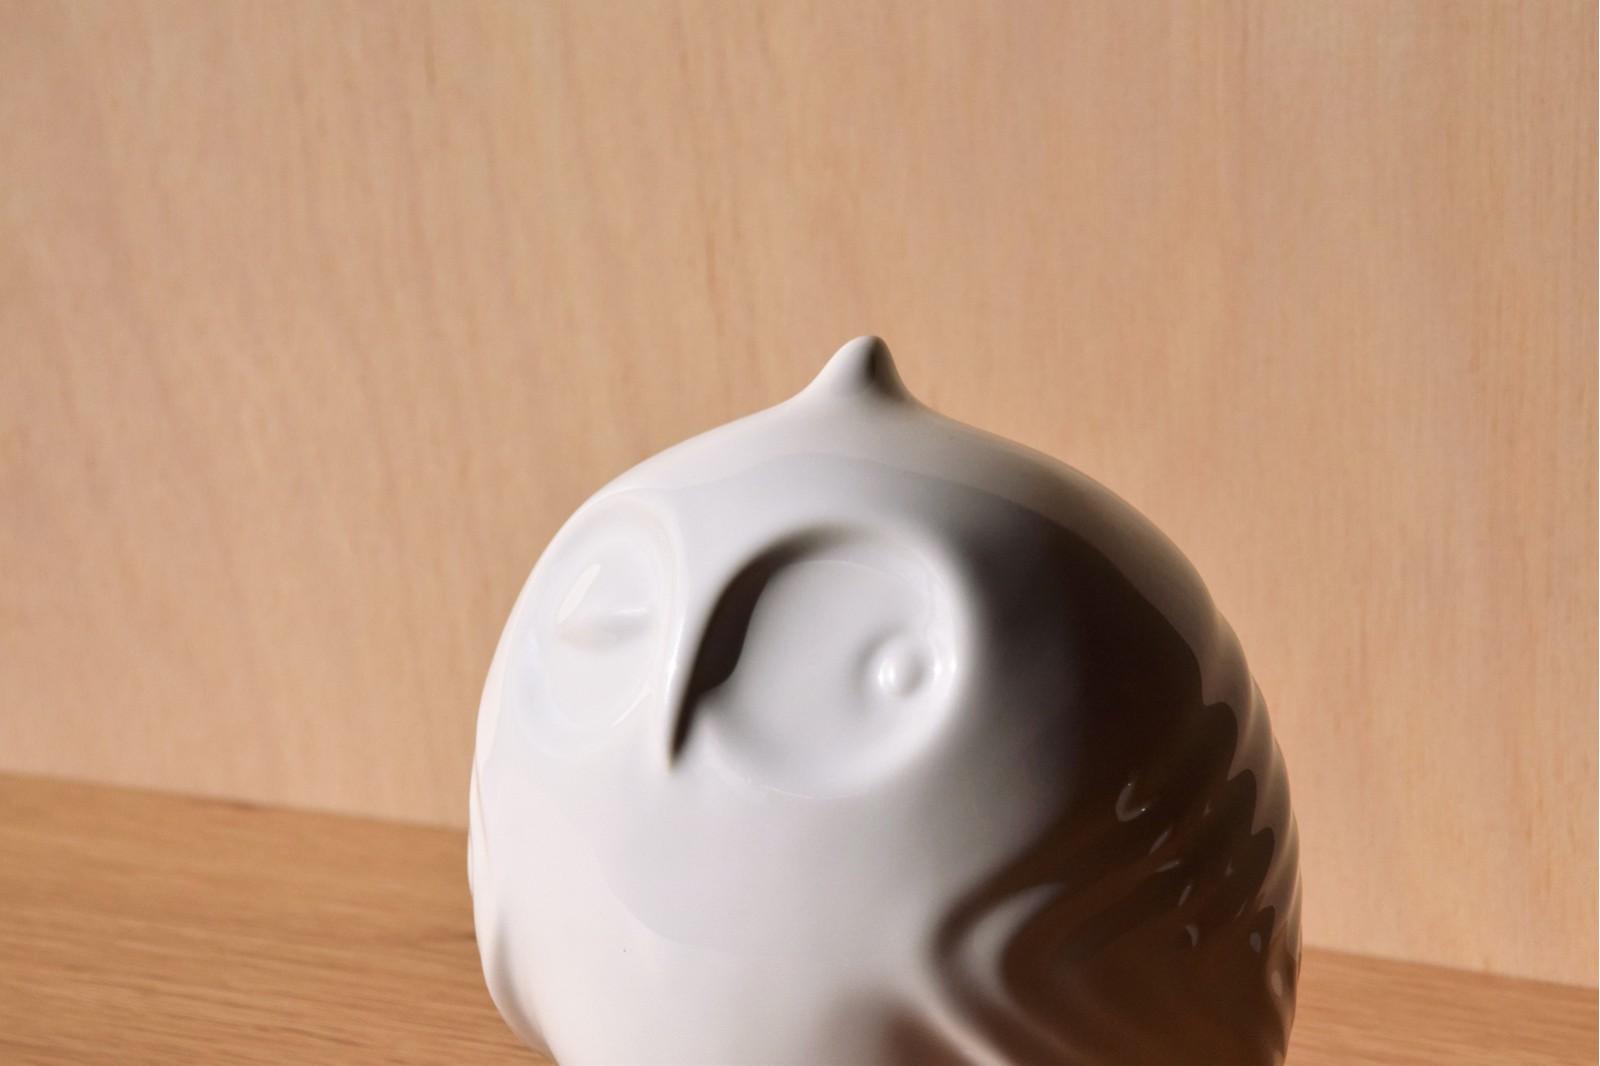 OWL COLLECTION. WHITE CERAMIC SCULPTURE